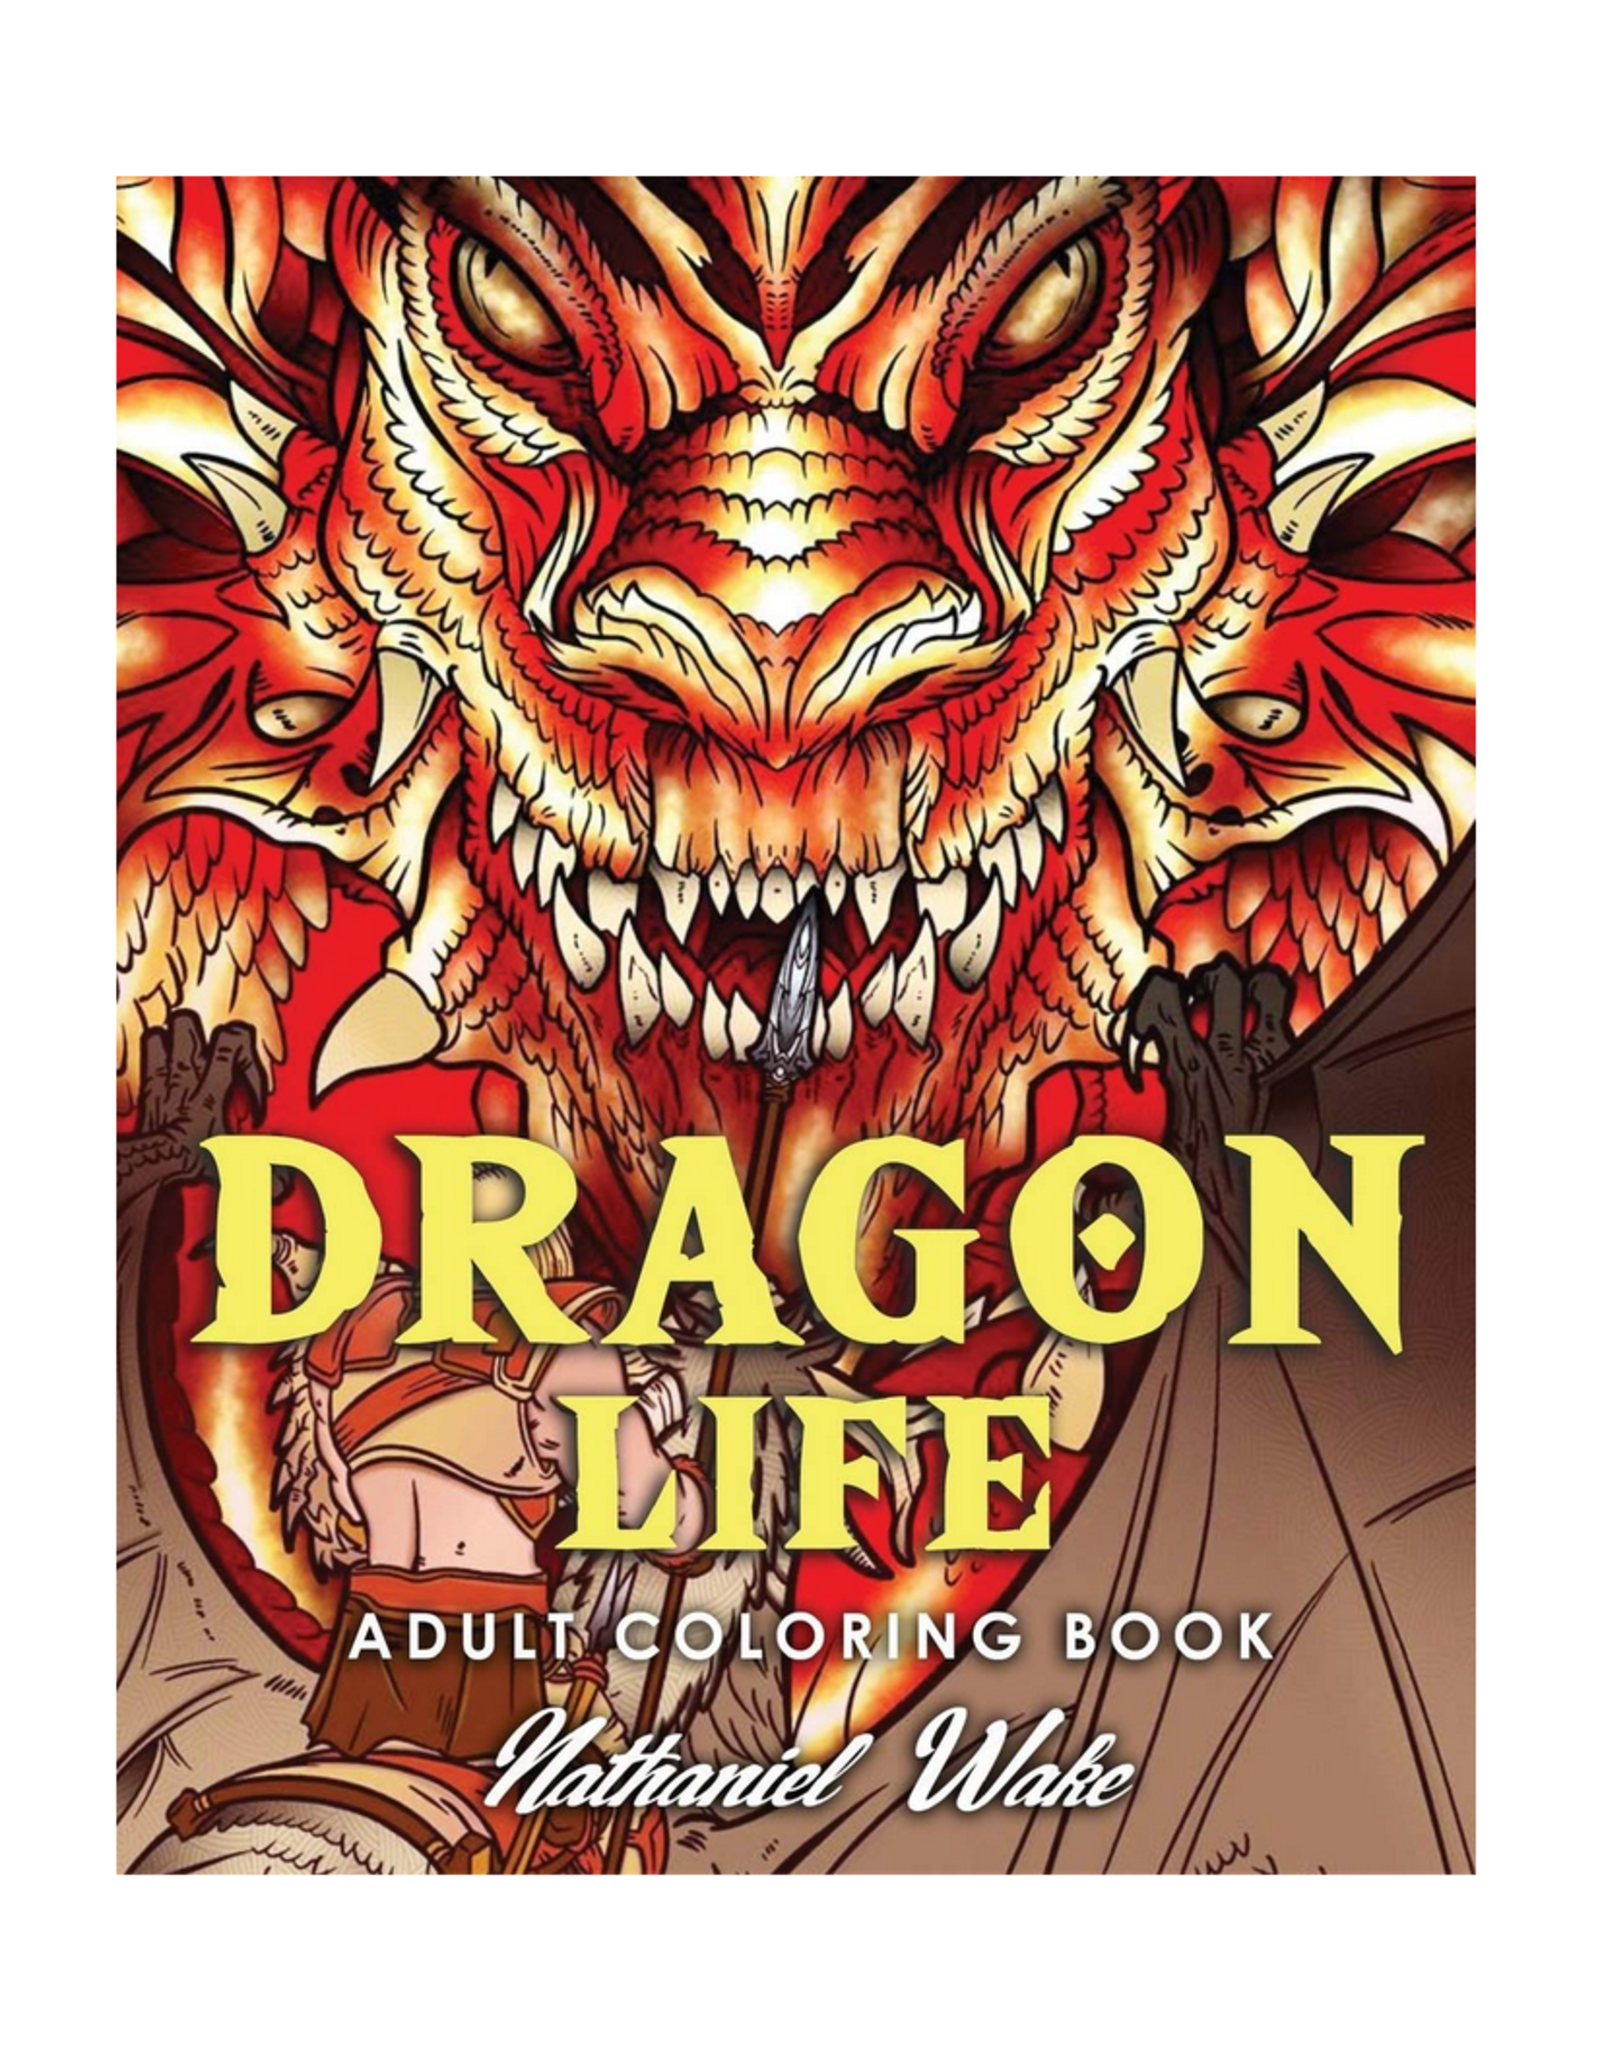 Nathaniel Wake Colouring Book for Adults, Dragon Life